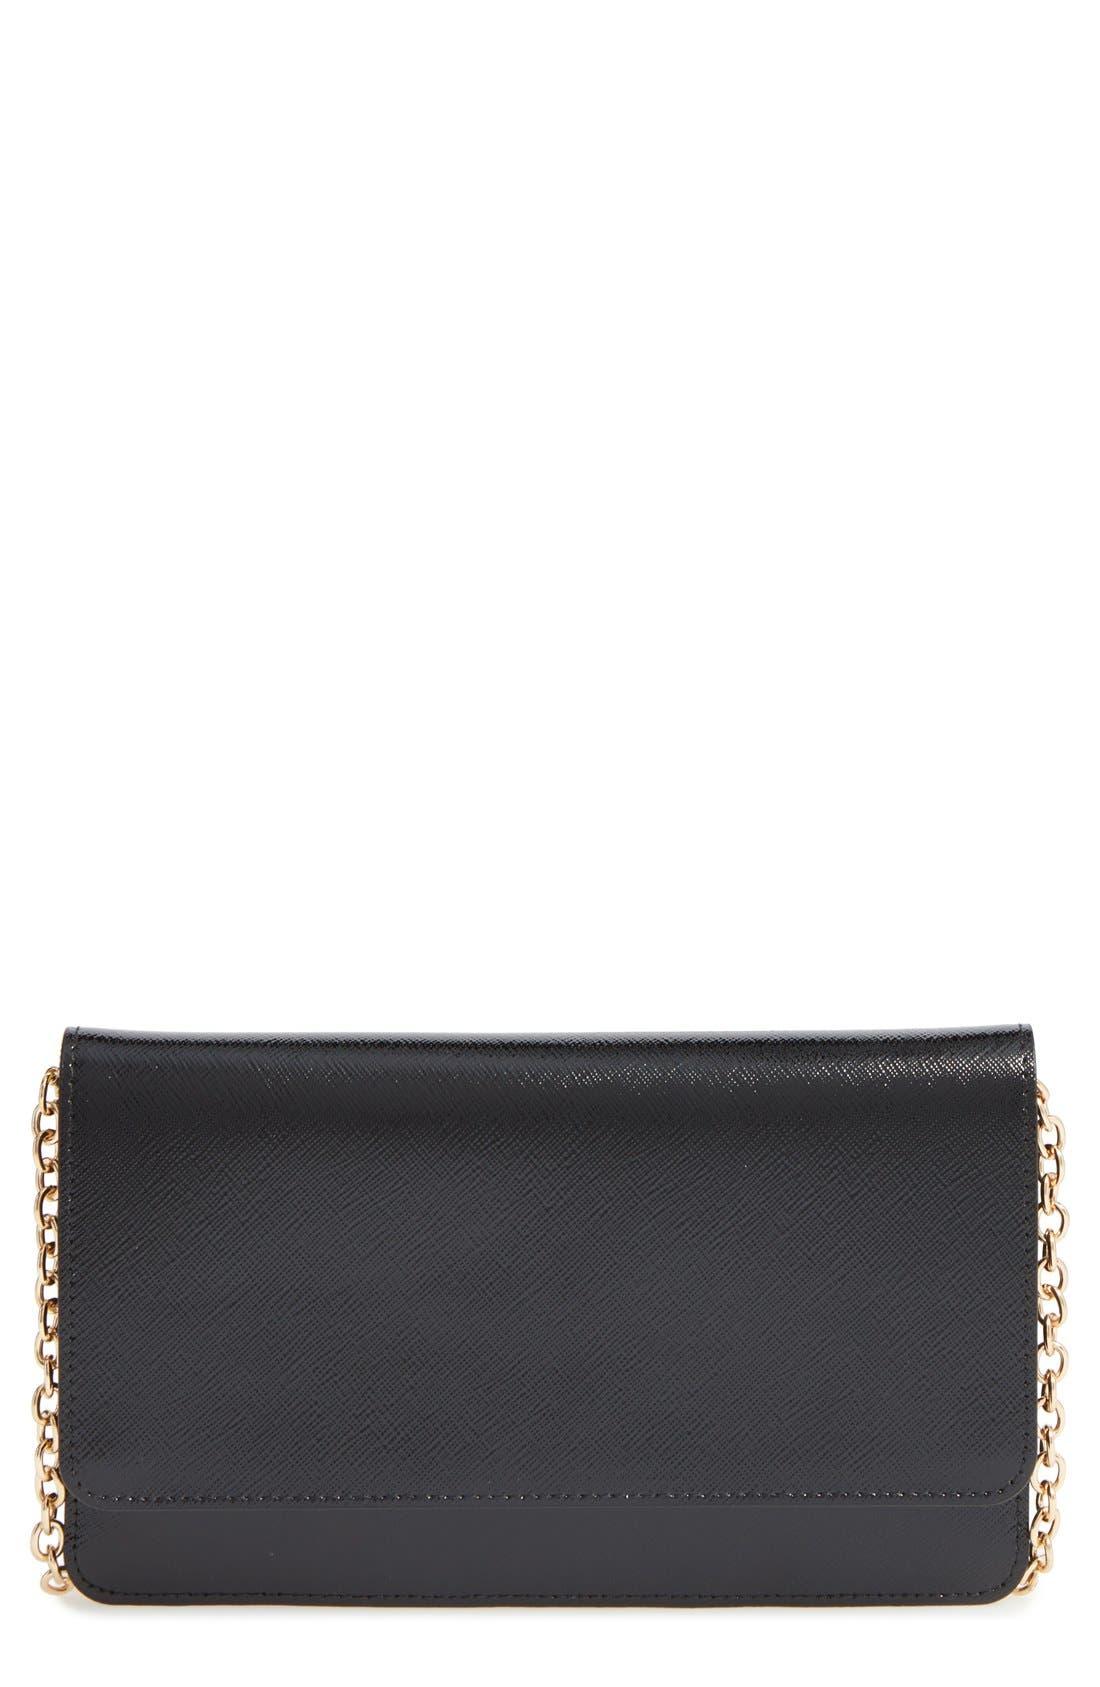 Alternate Image 1 Selected - Halogen® 'Eve' Leather Crossbody Bag